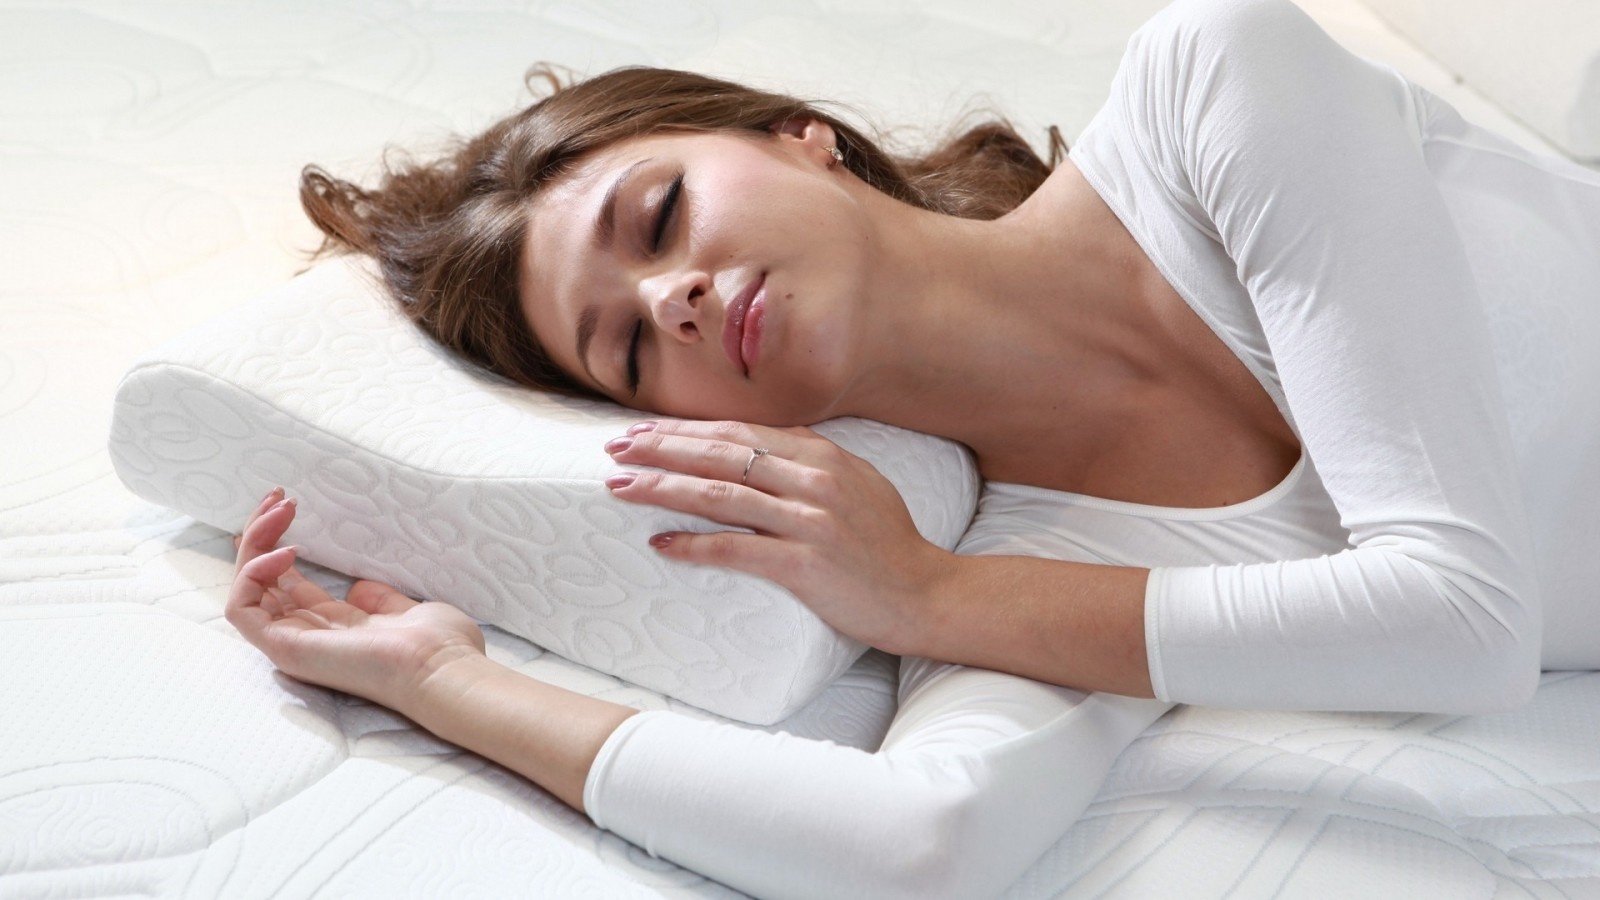 9 Best Pregnancy Pillows That Will Not Go Flat (2019 Reviews)